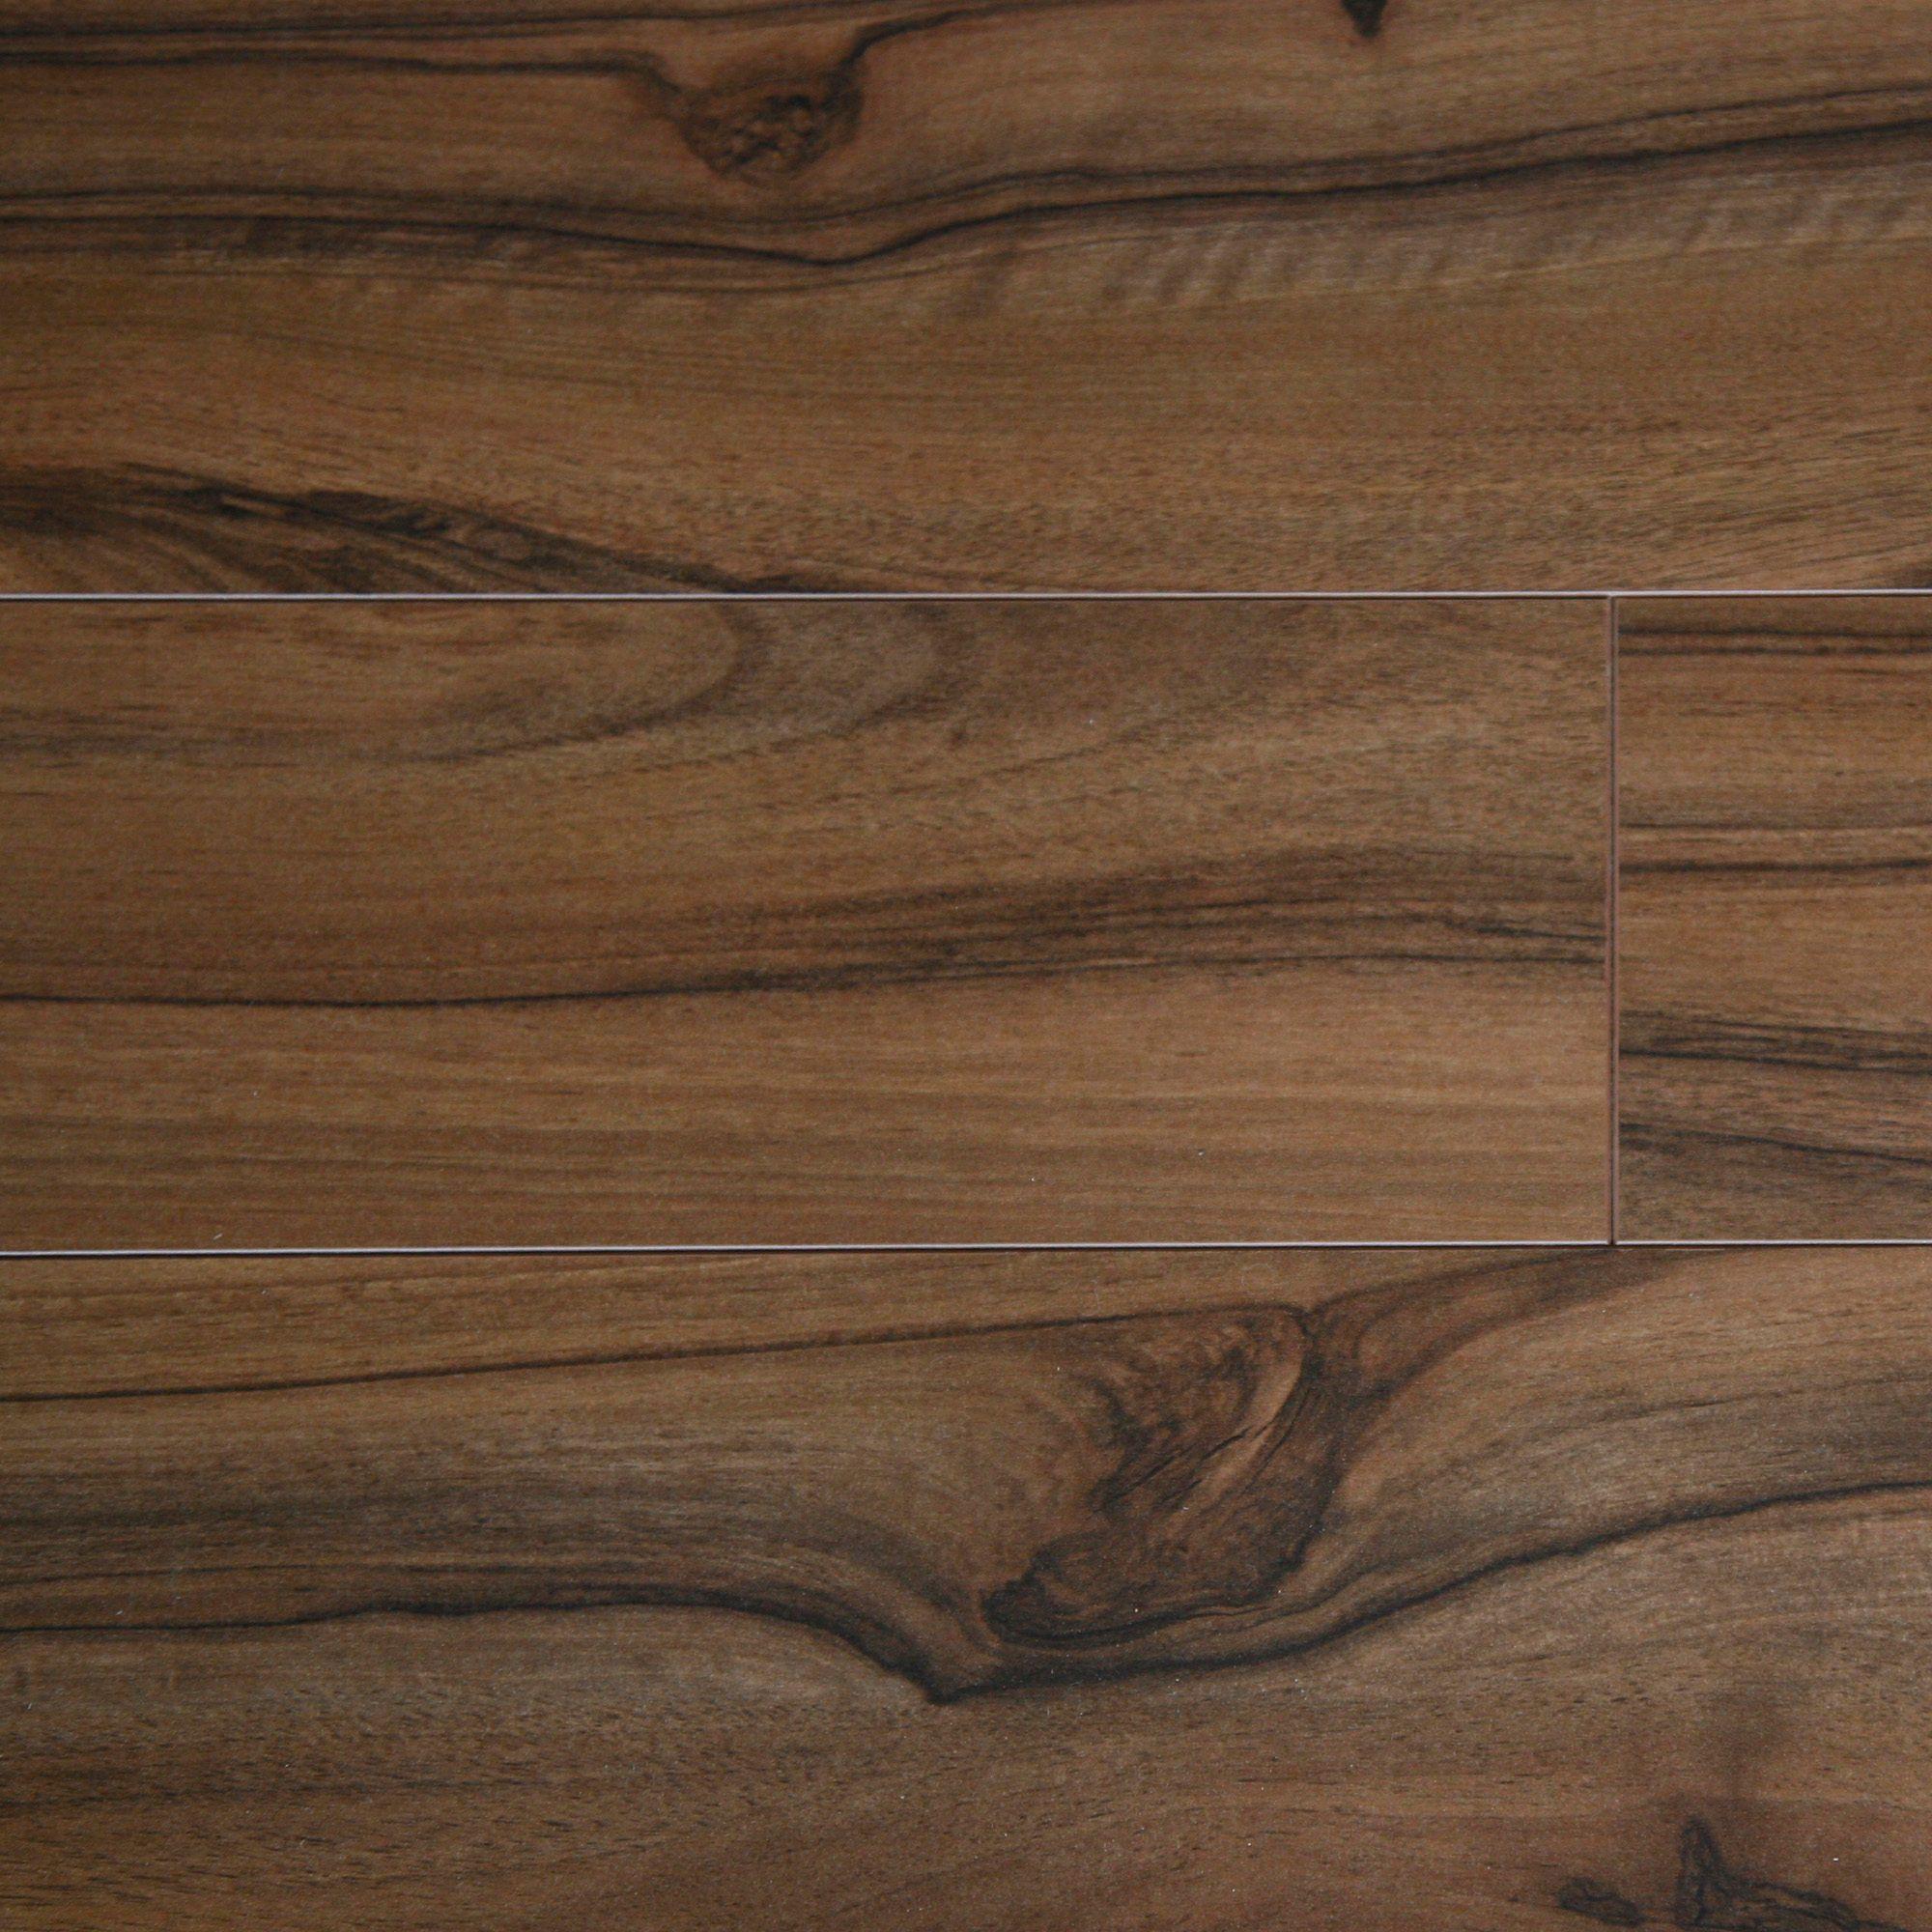 Scherzo natural dark walnut effect laminate flooring for Laminate flooring examples